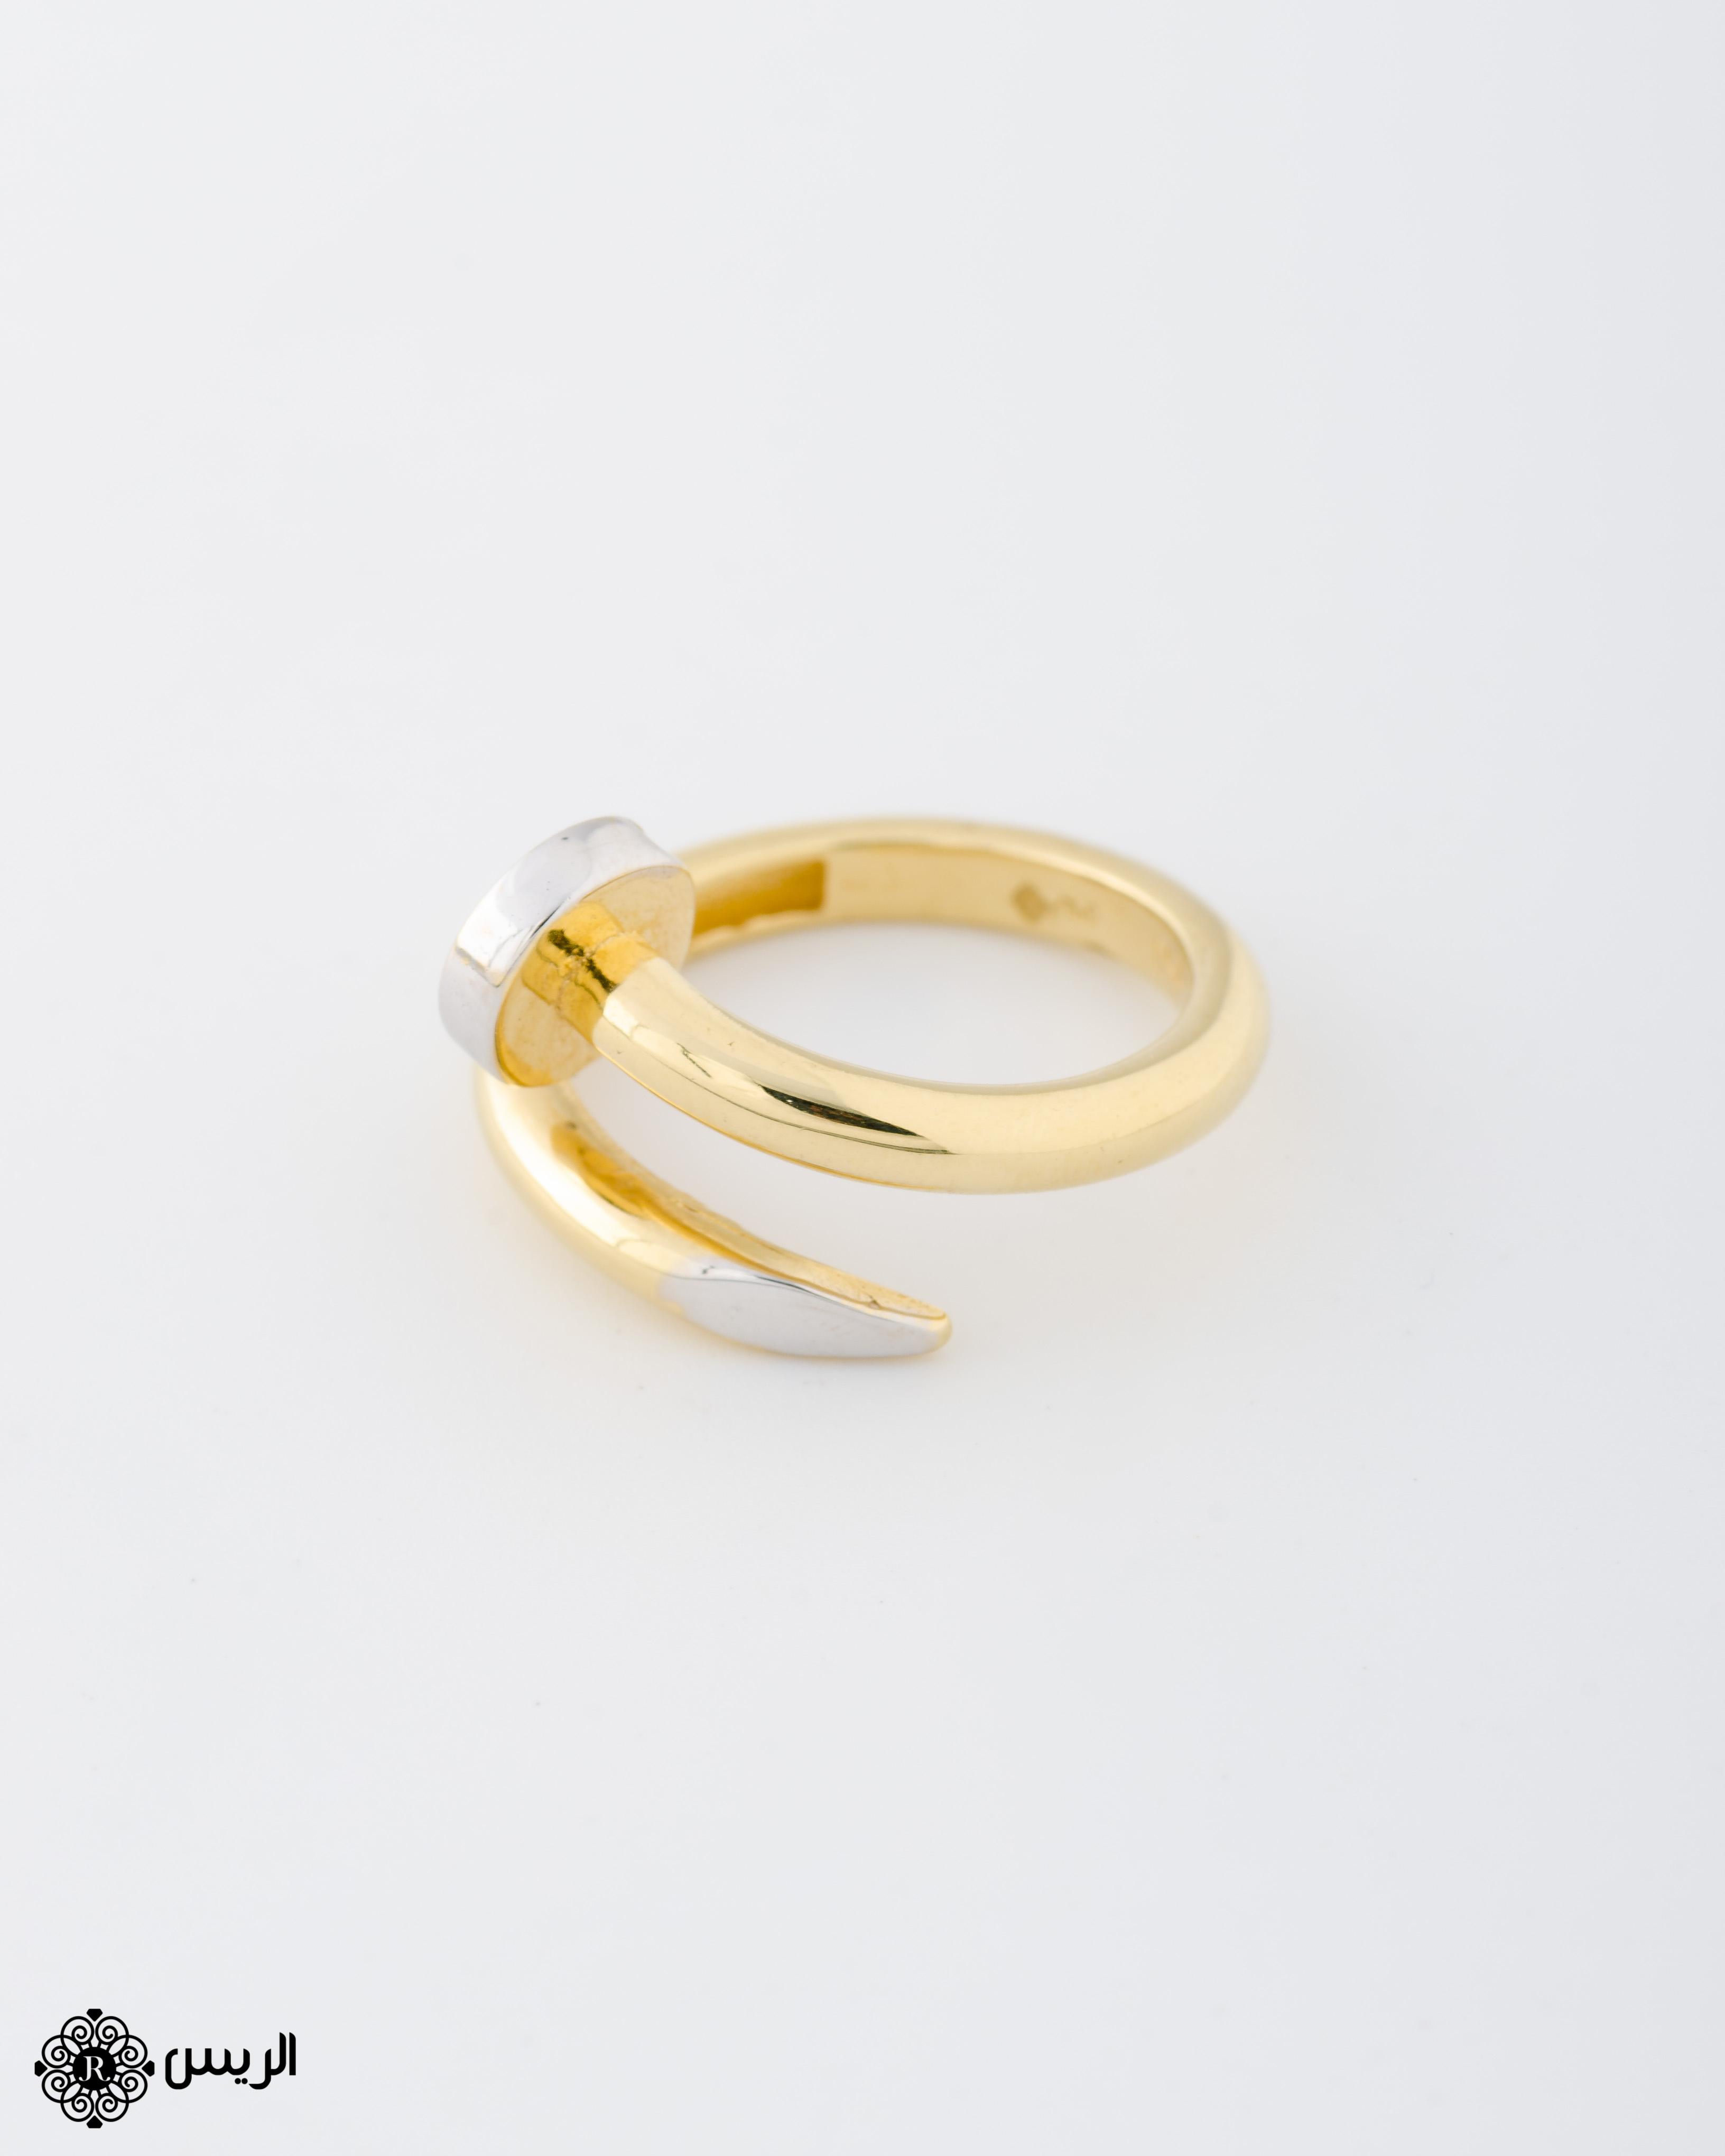 Raies jewelry Ring Nail خاتم مسمار الريس للمجوهرات